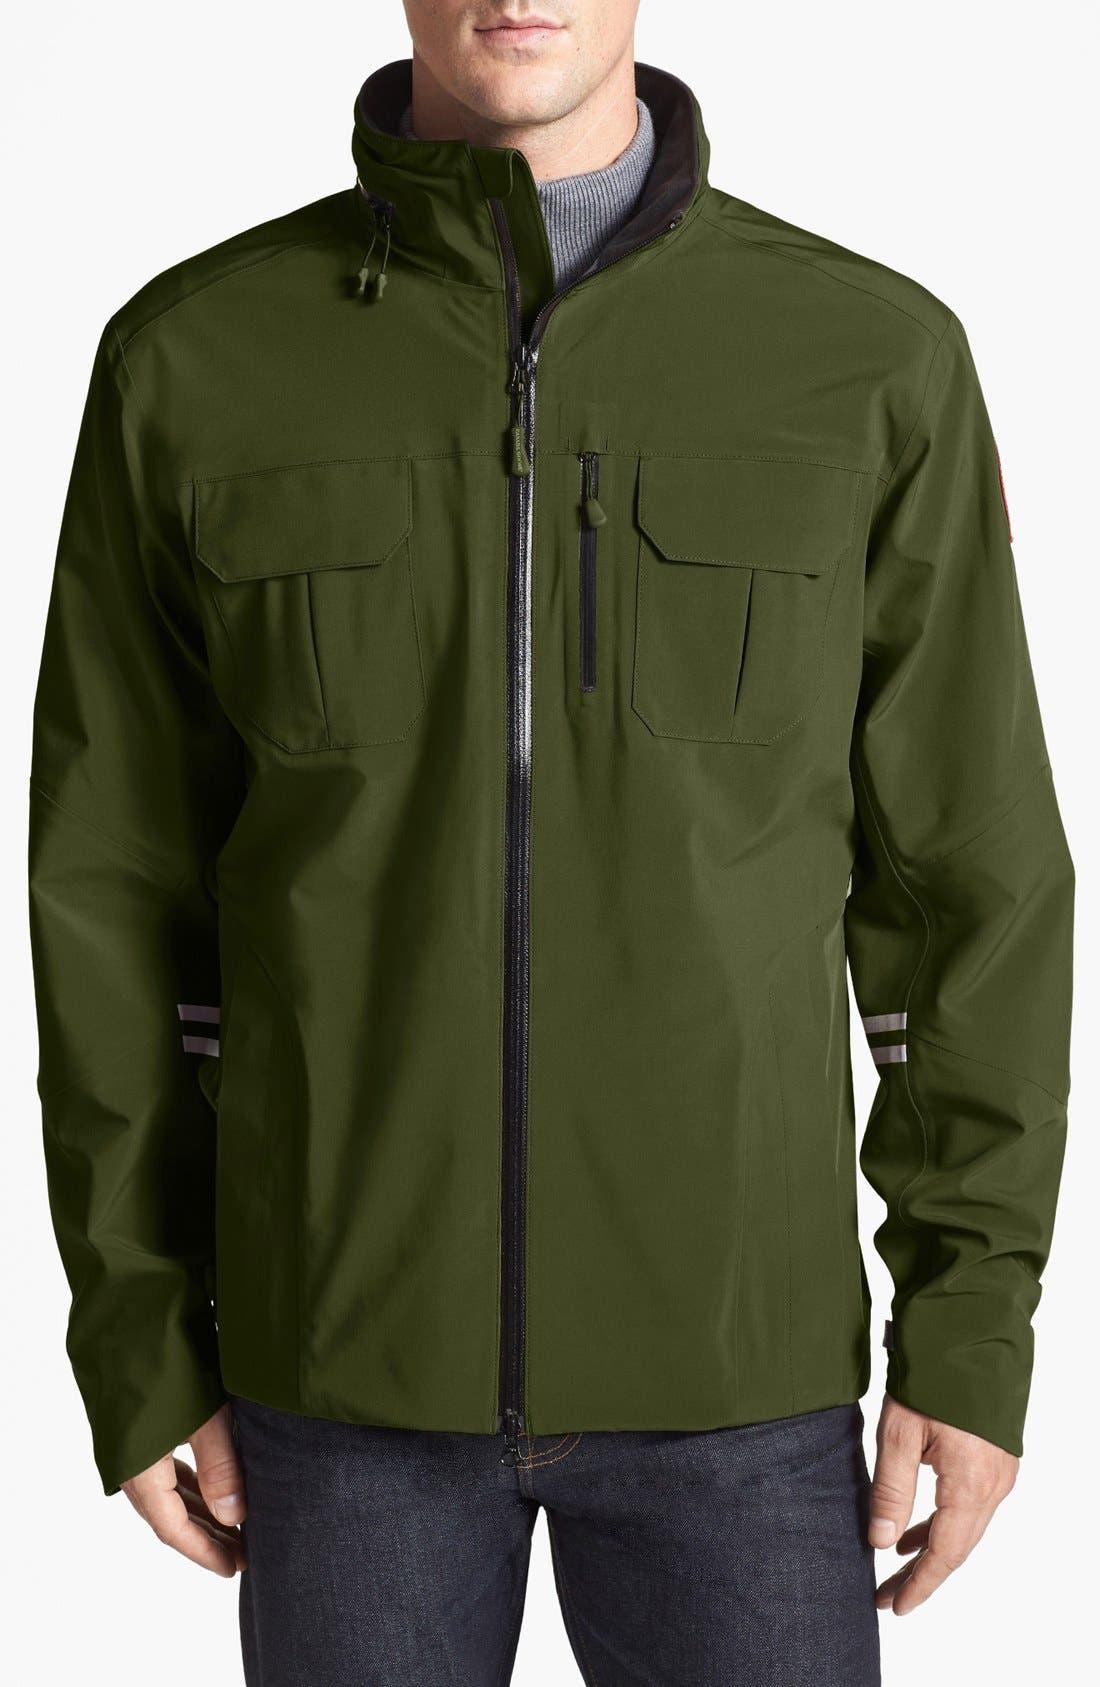 Main Image - Canada Goose 'Moraine' Jacket